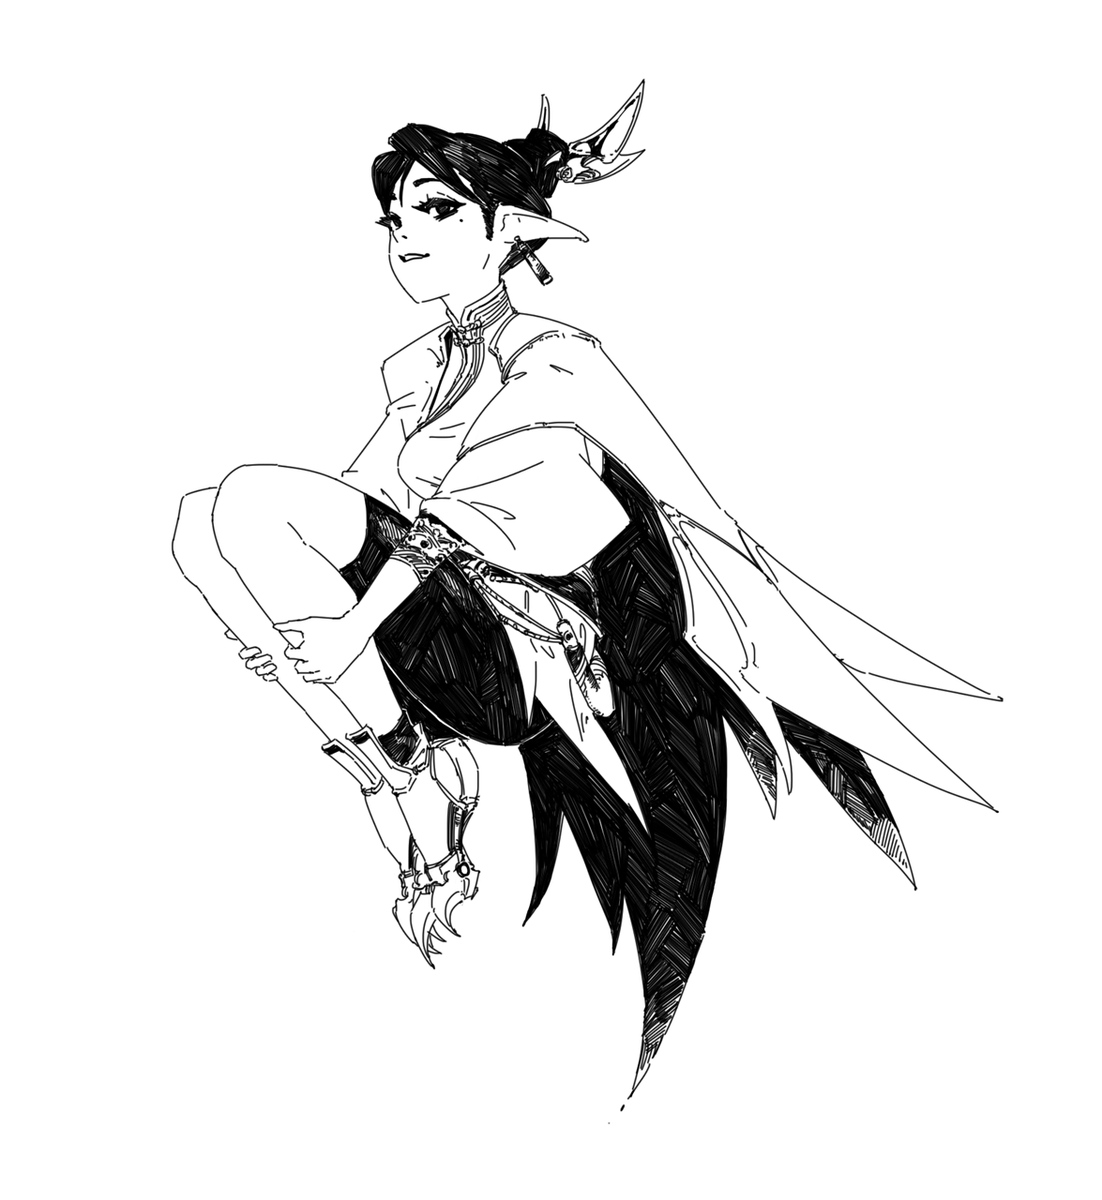 RT @666KArt: 253 daily sketch. bird princess https://t.co/ECuOZNQyox